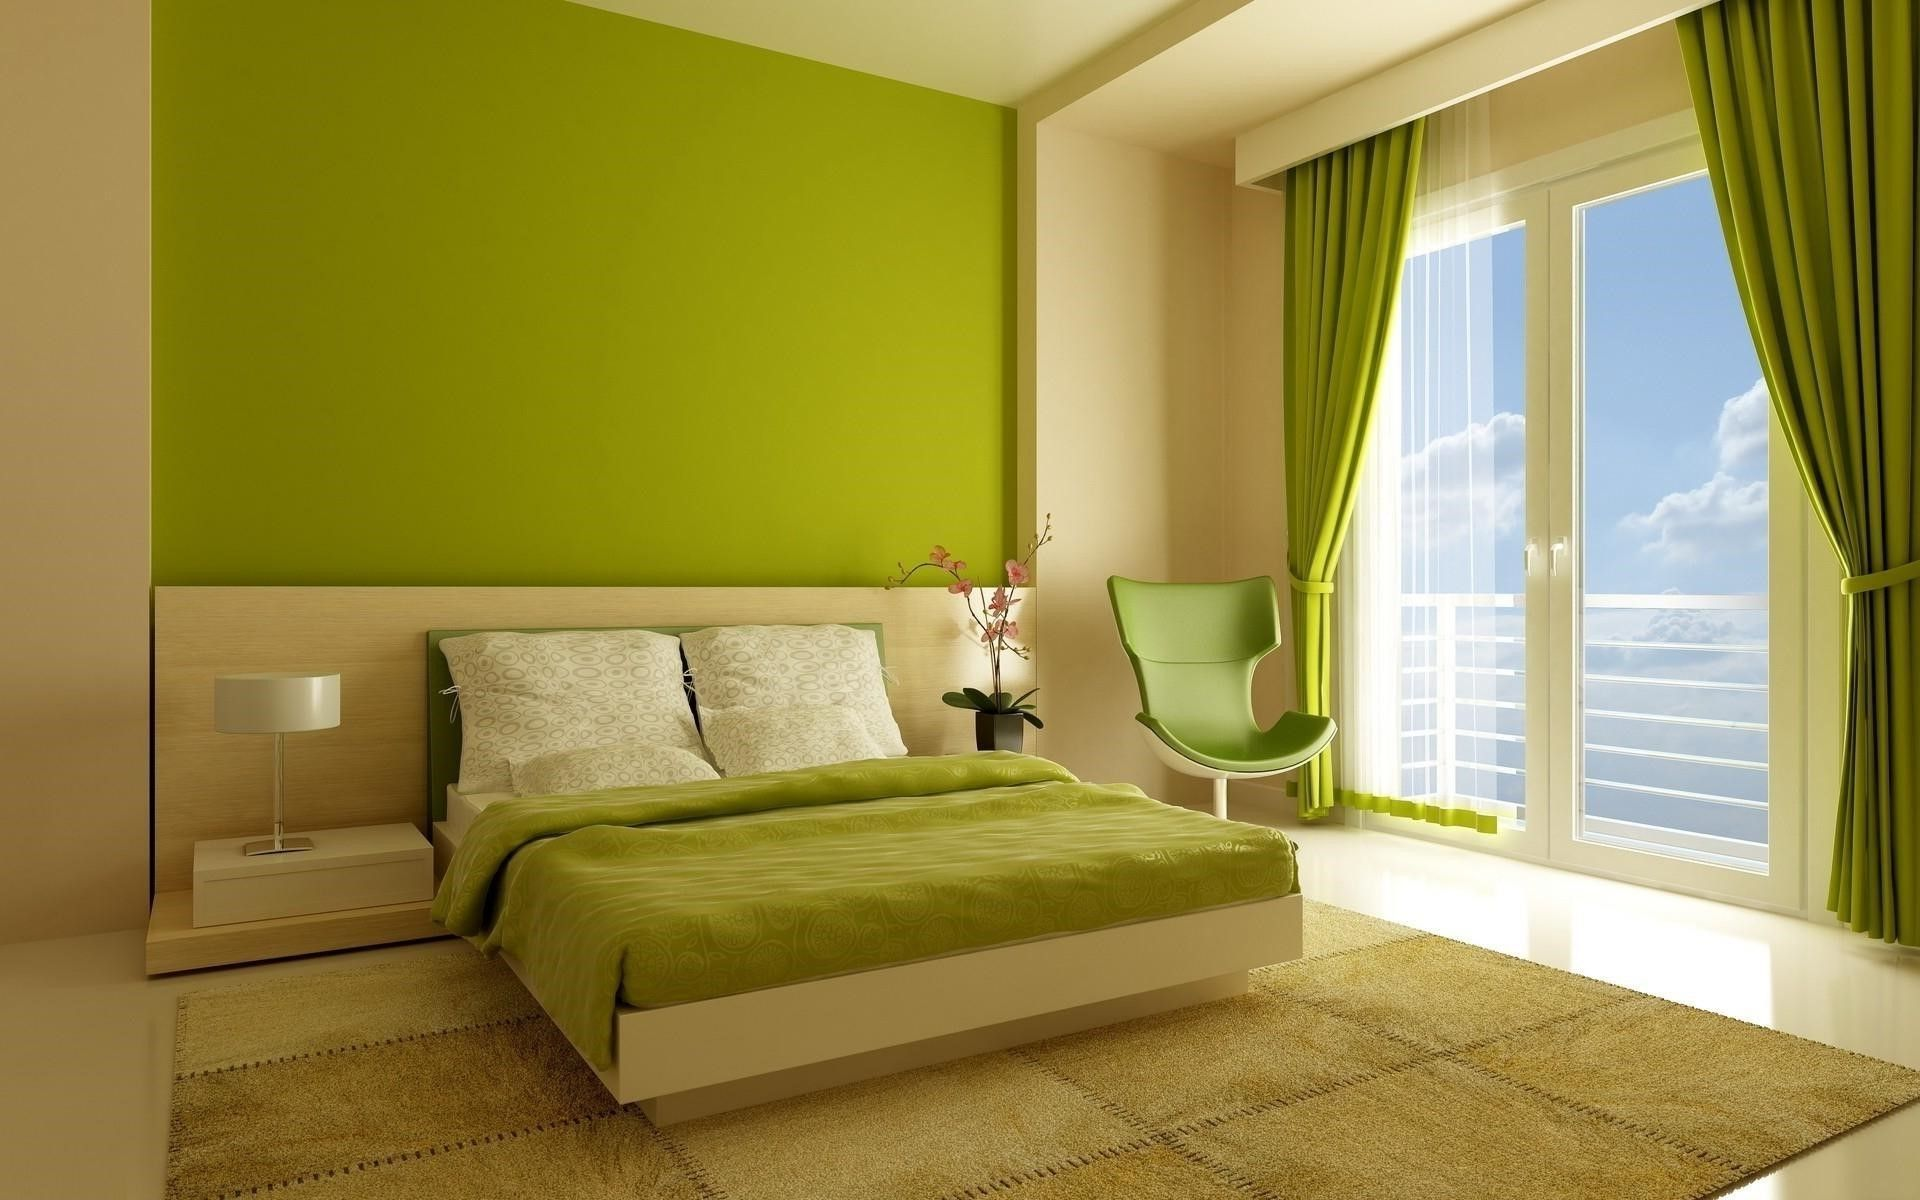 bedroom colour ideas as per vastu | Main door, Bedrooms and House ...